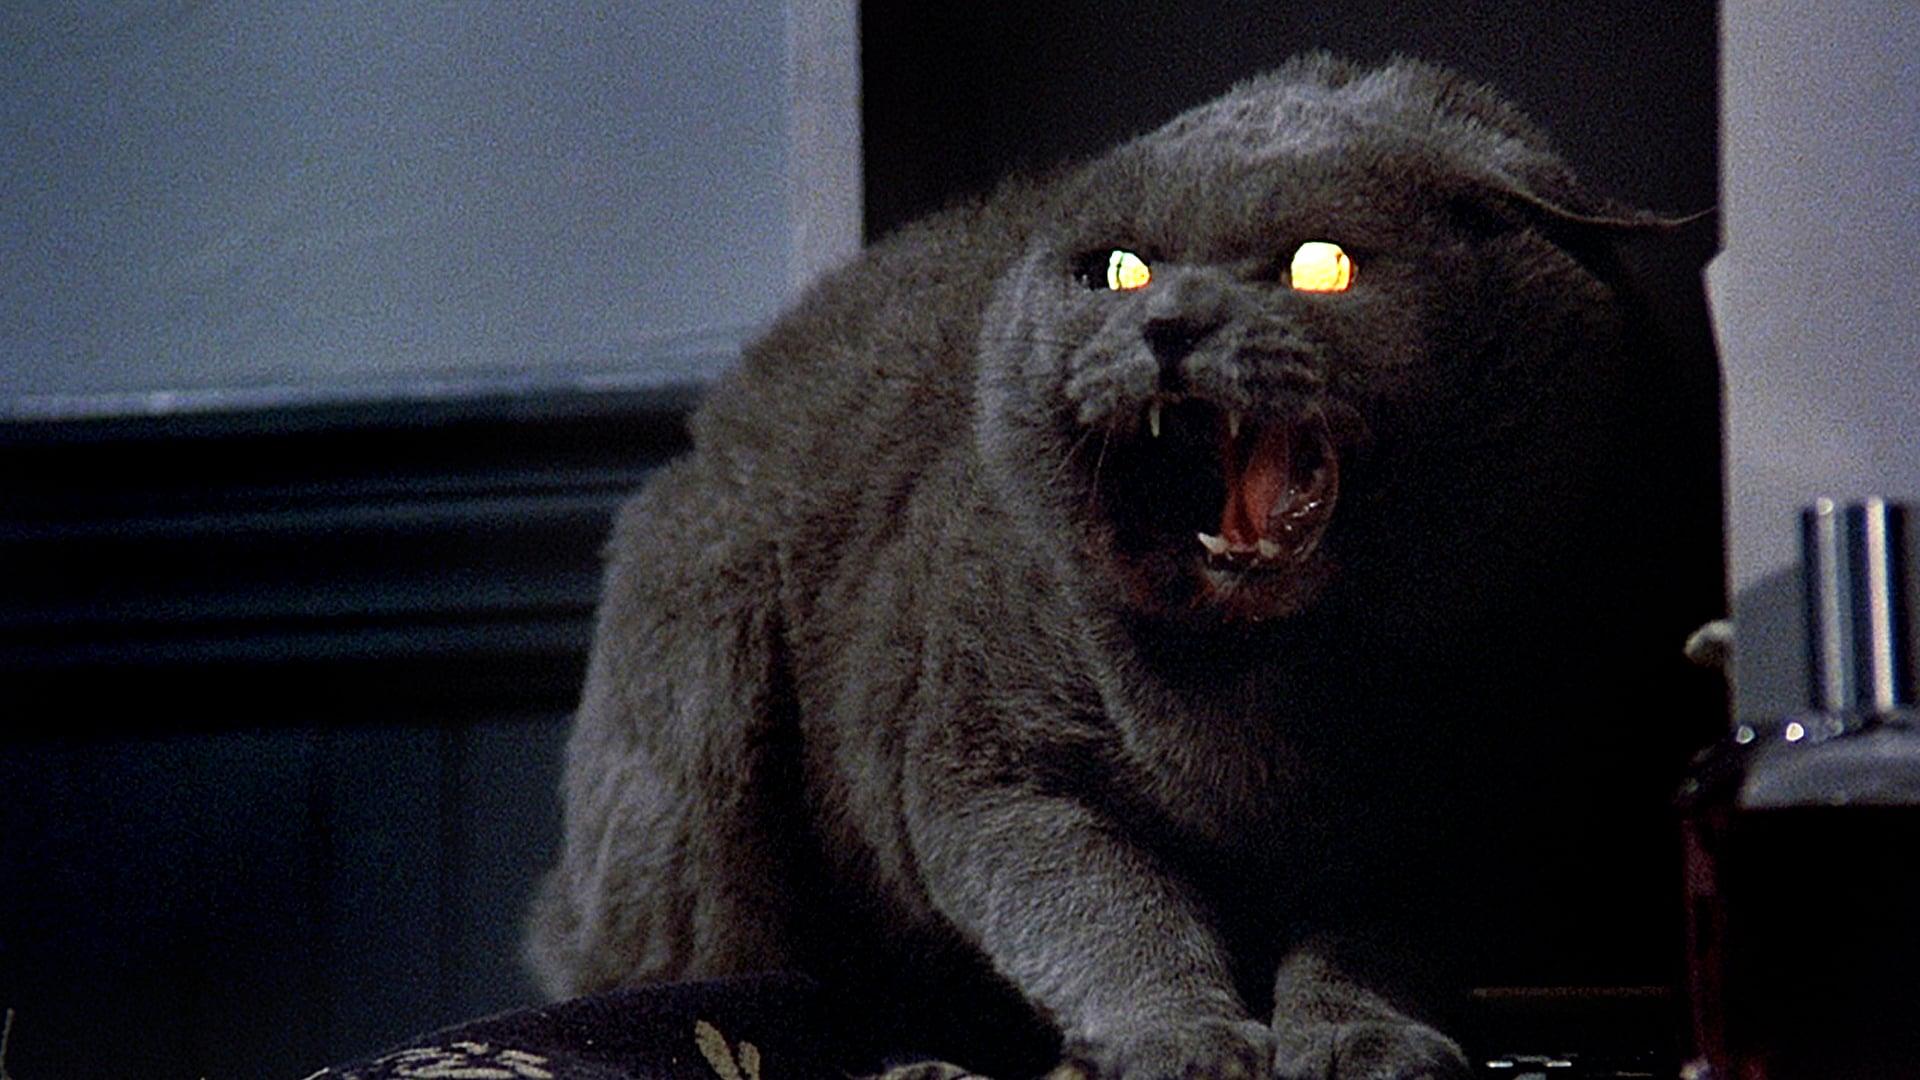 Church, the Creed family's demonic cat, in the original Pet Sematary